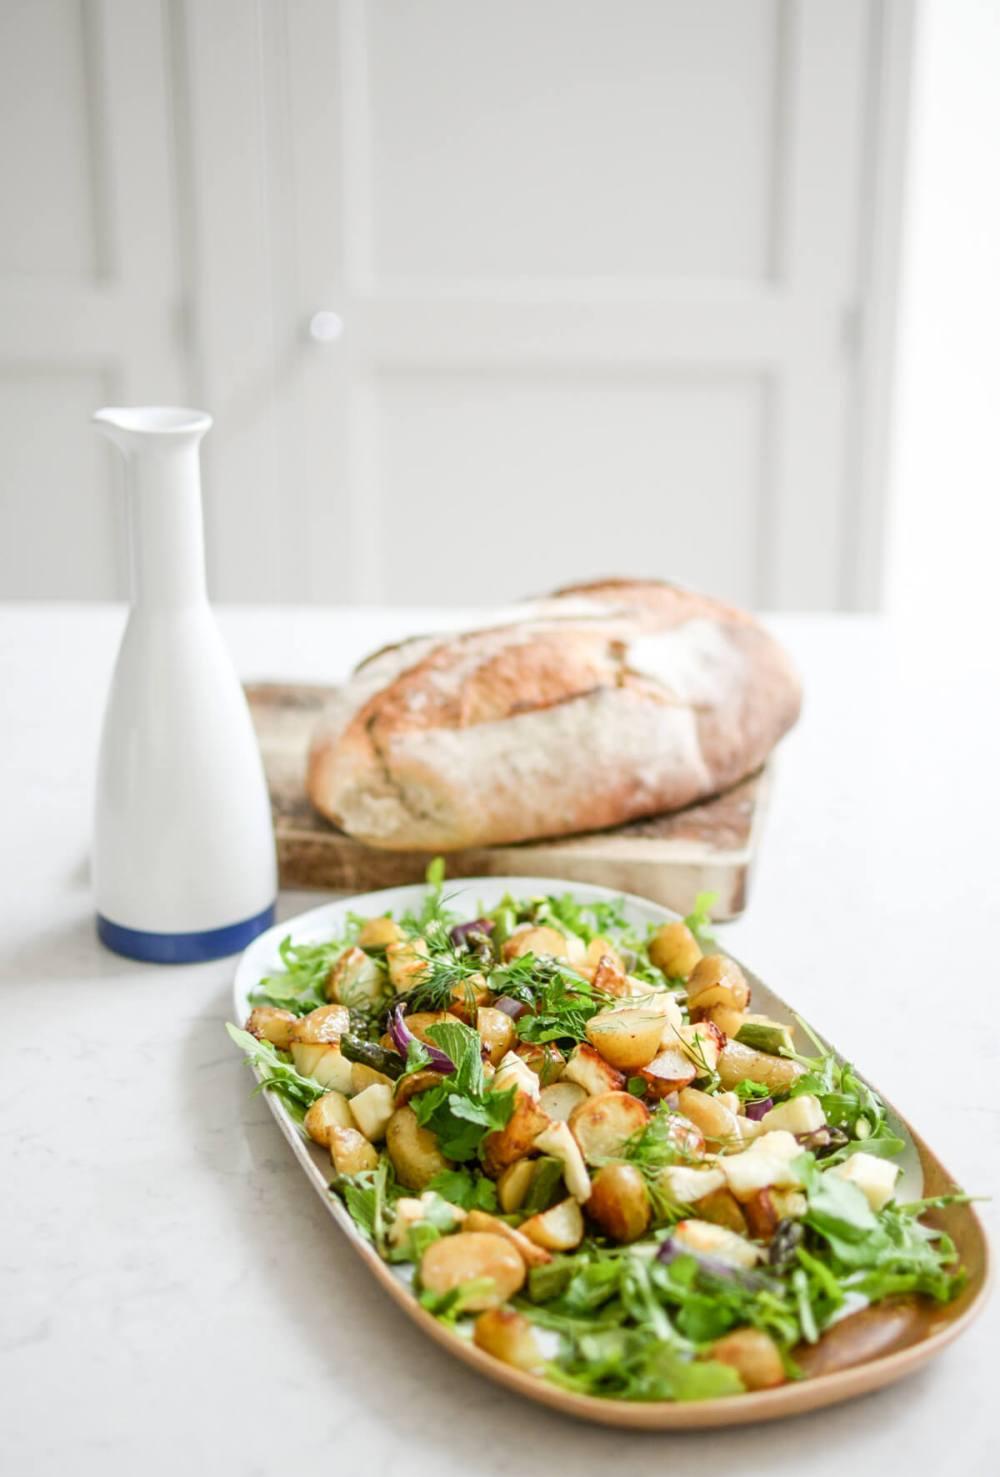 Recipe: Warm New Potato, Asparagus and Halloumi Salad